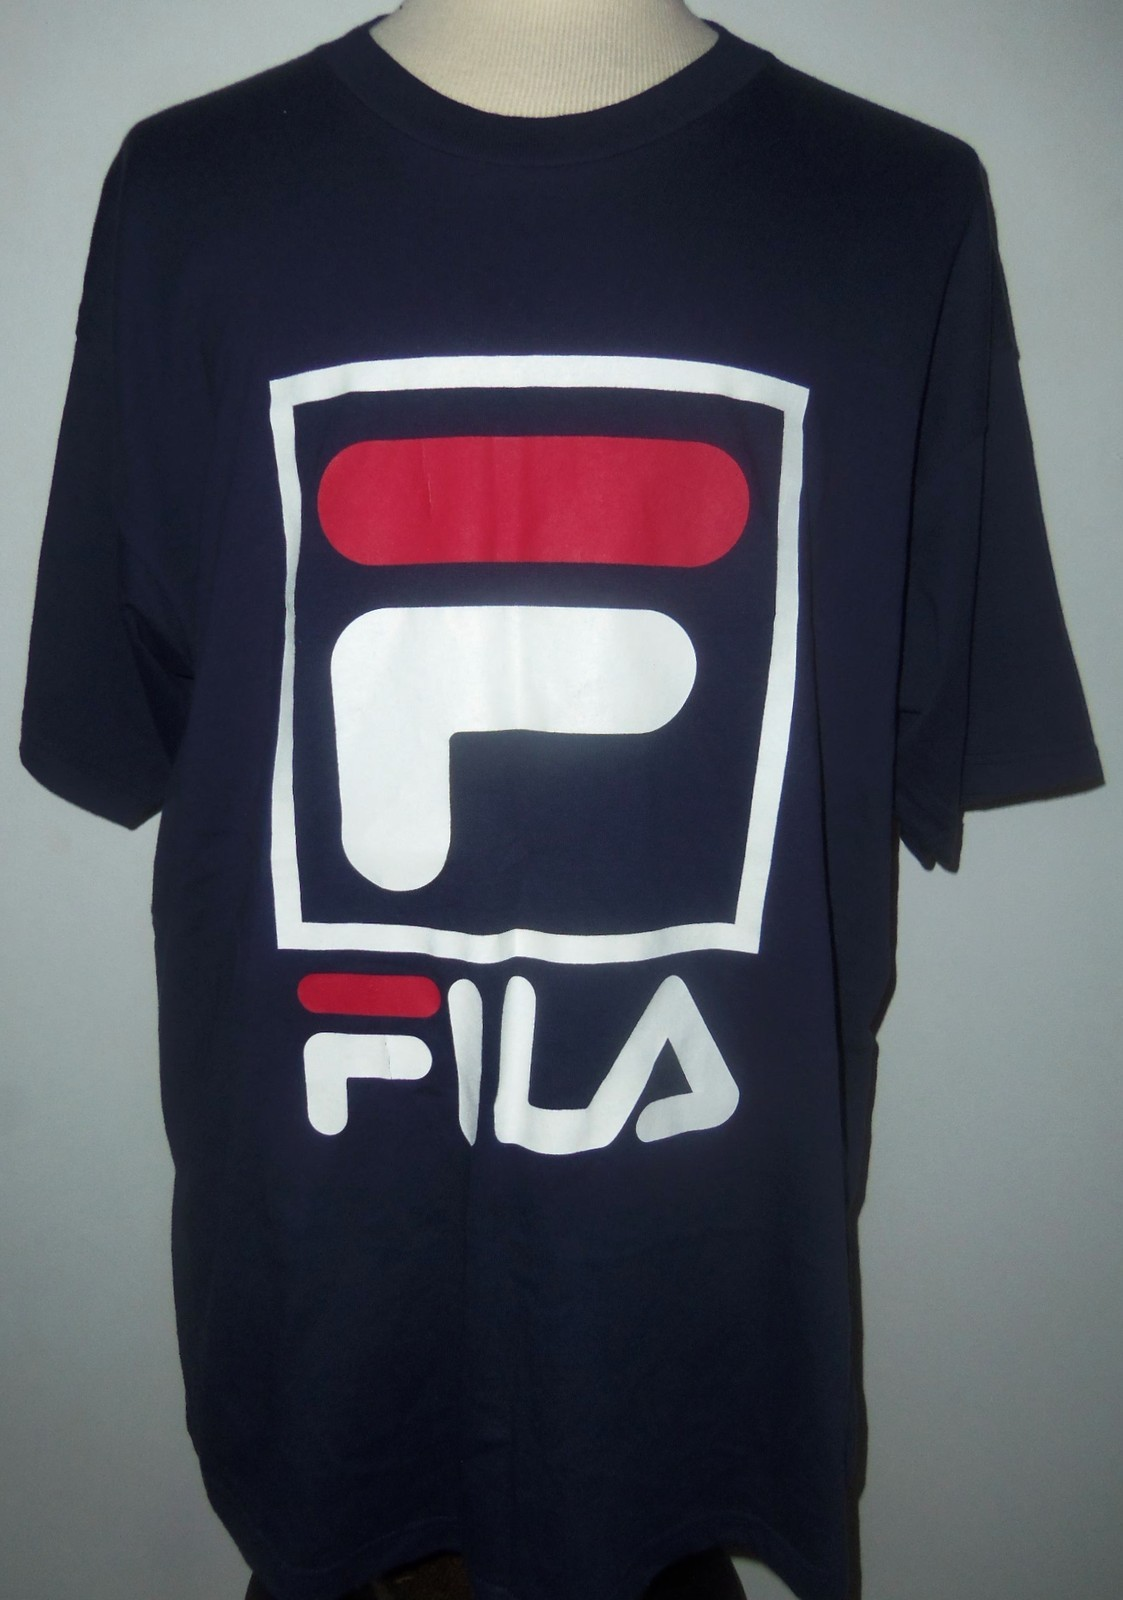 Fila T Shirt 1996 Defy New York Sneakers Music Fashion